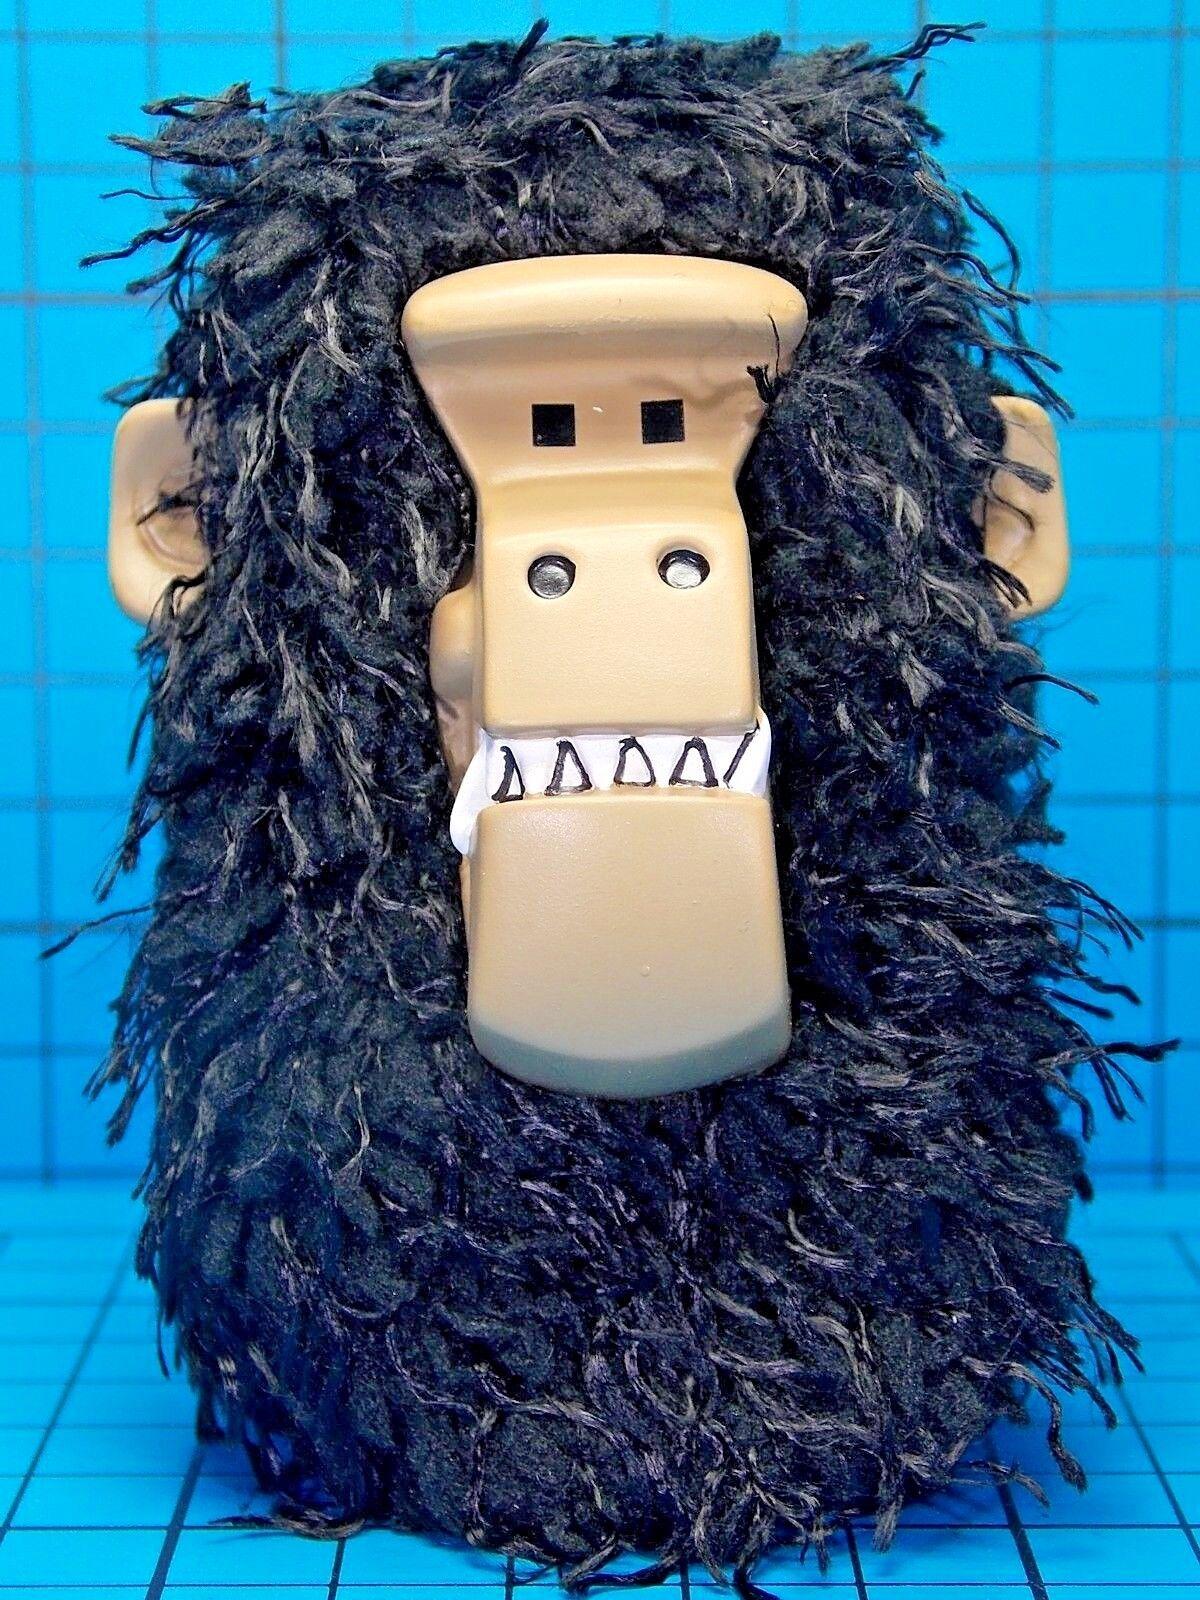 ACI x Jason Siu 1:6 Primates In Concrete Jungle Figure - Gorilla Head Sculpt